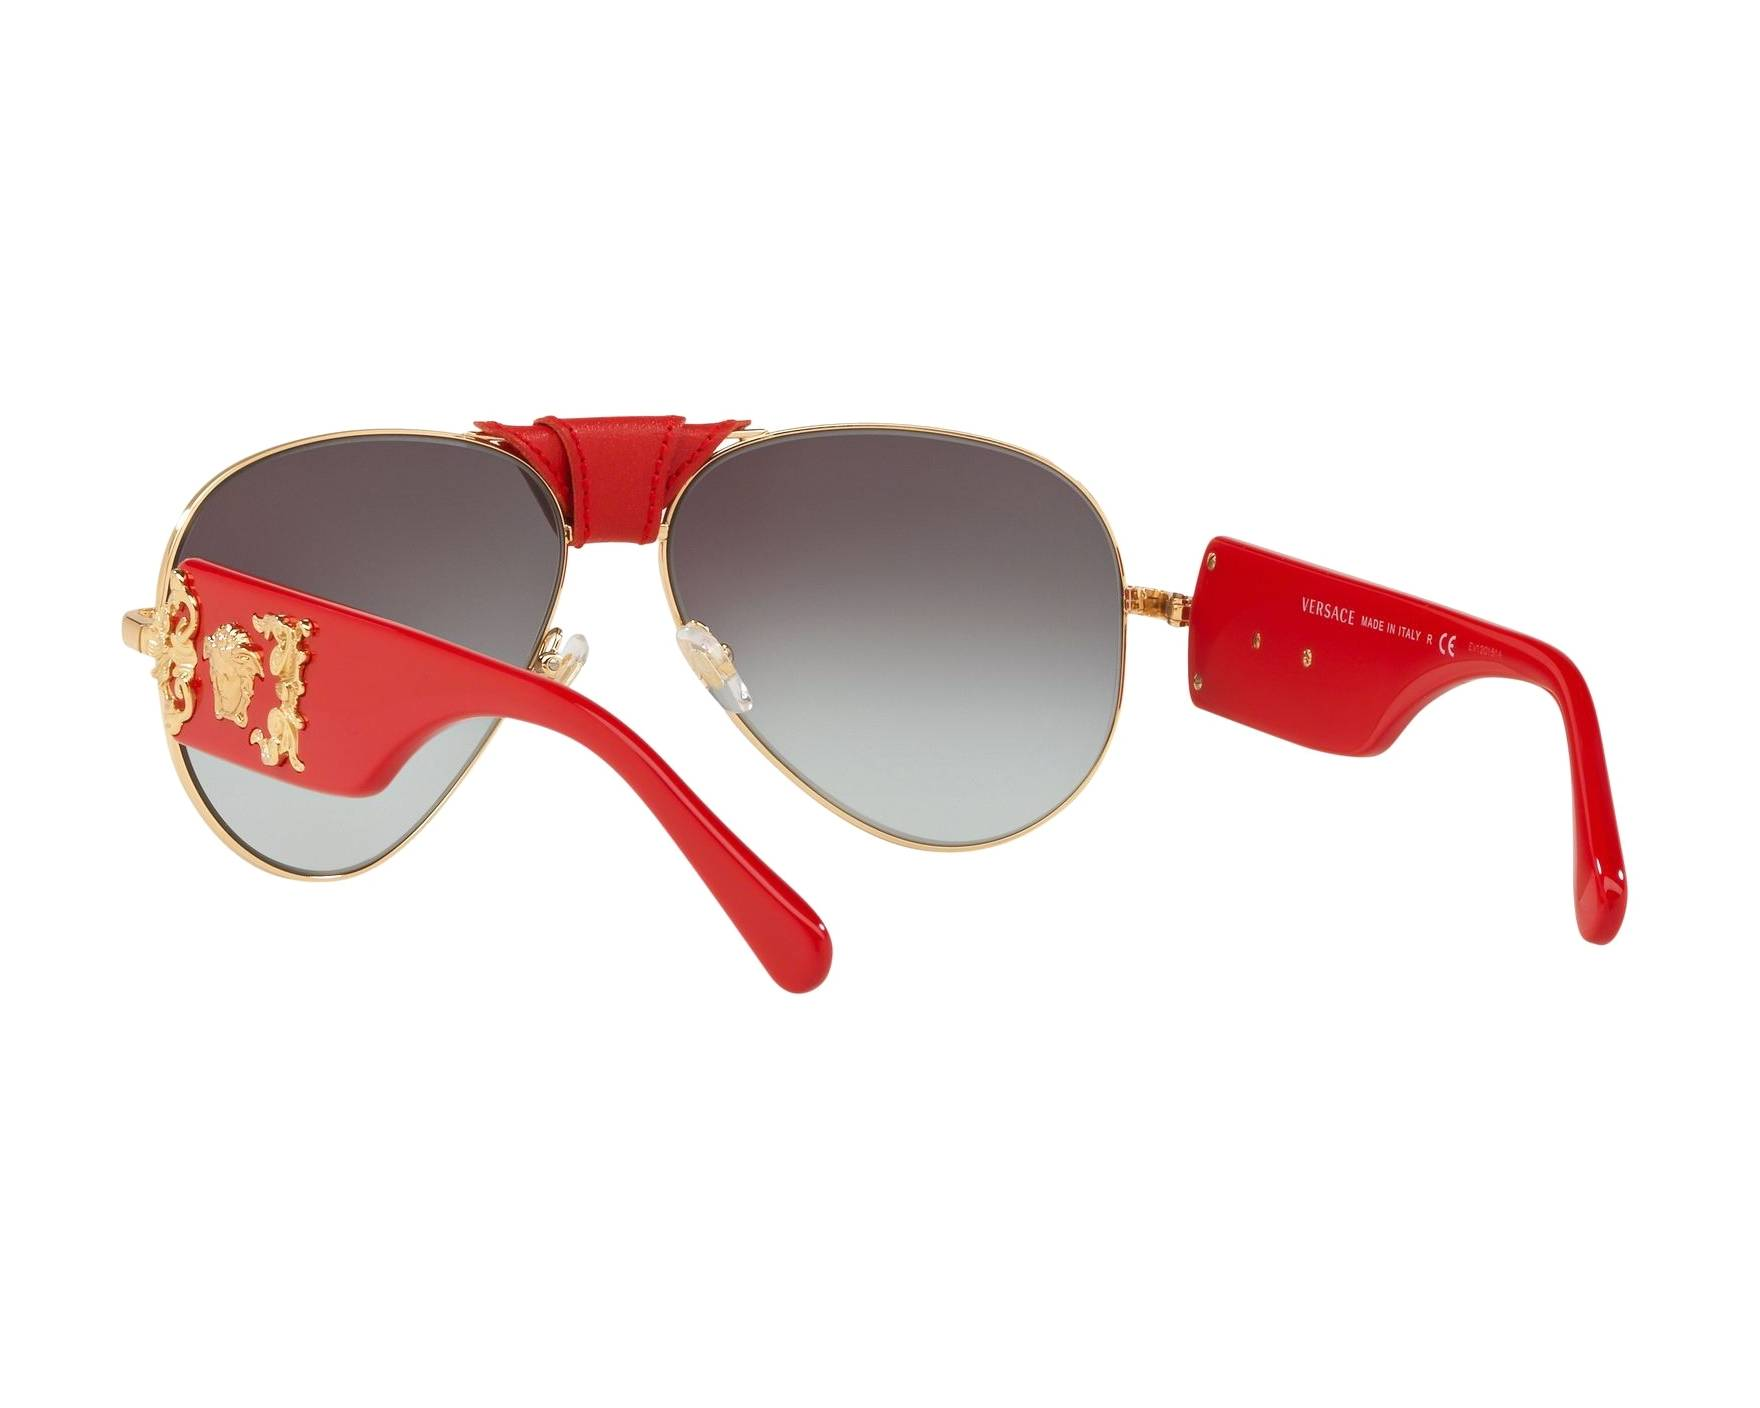 fae760e172 Sunglasses Versace VE-2150-Q 100211 62-14 Gold Red 360 degree view